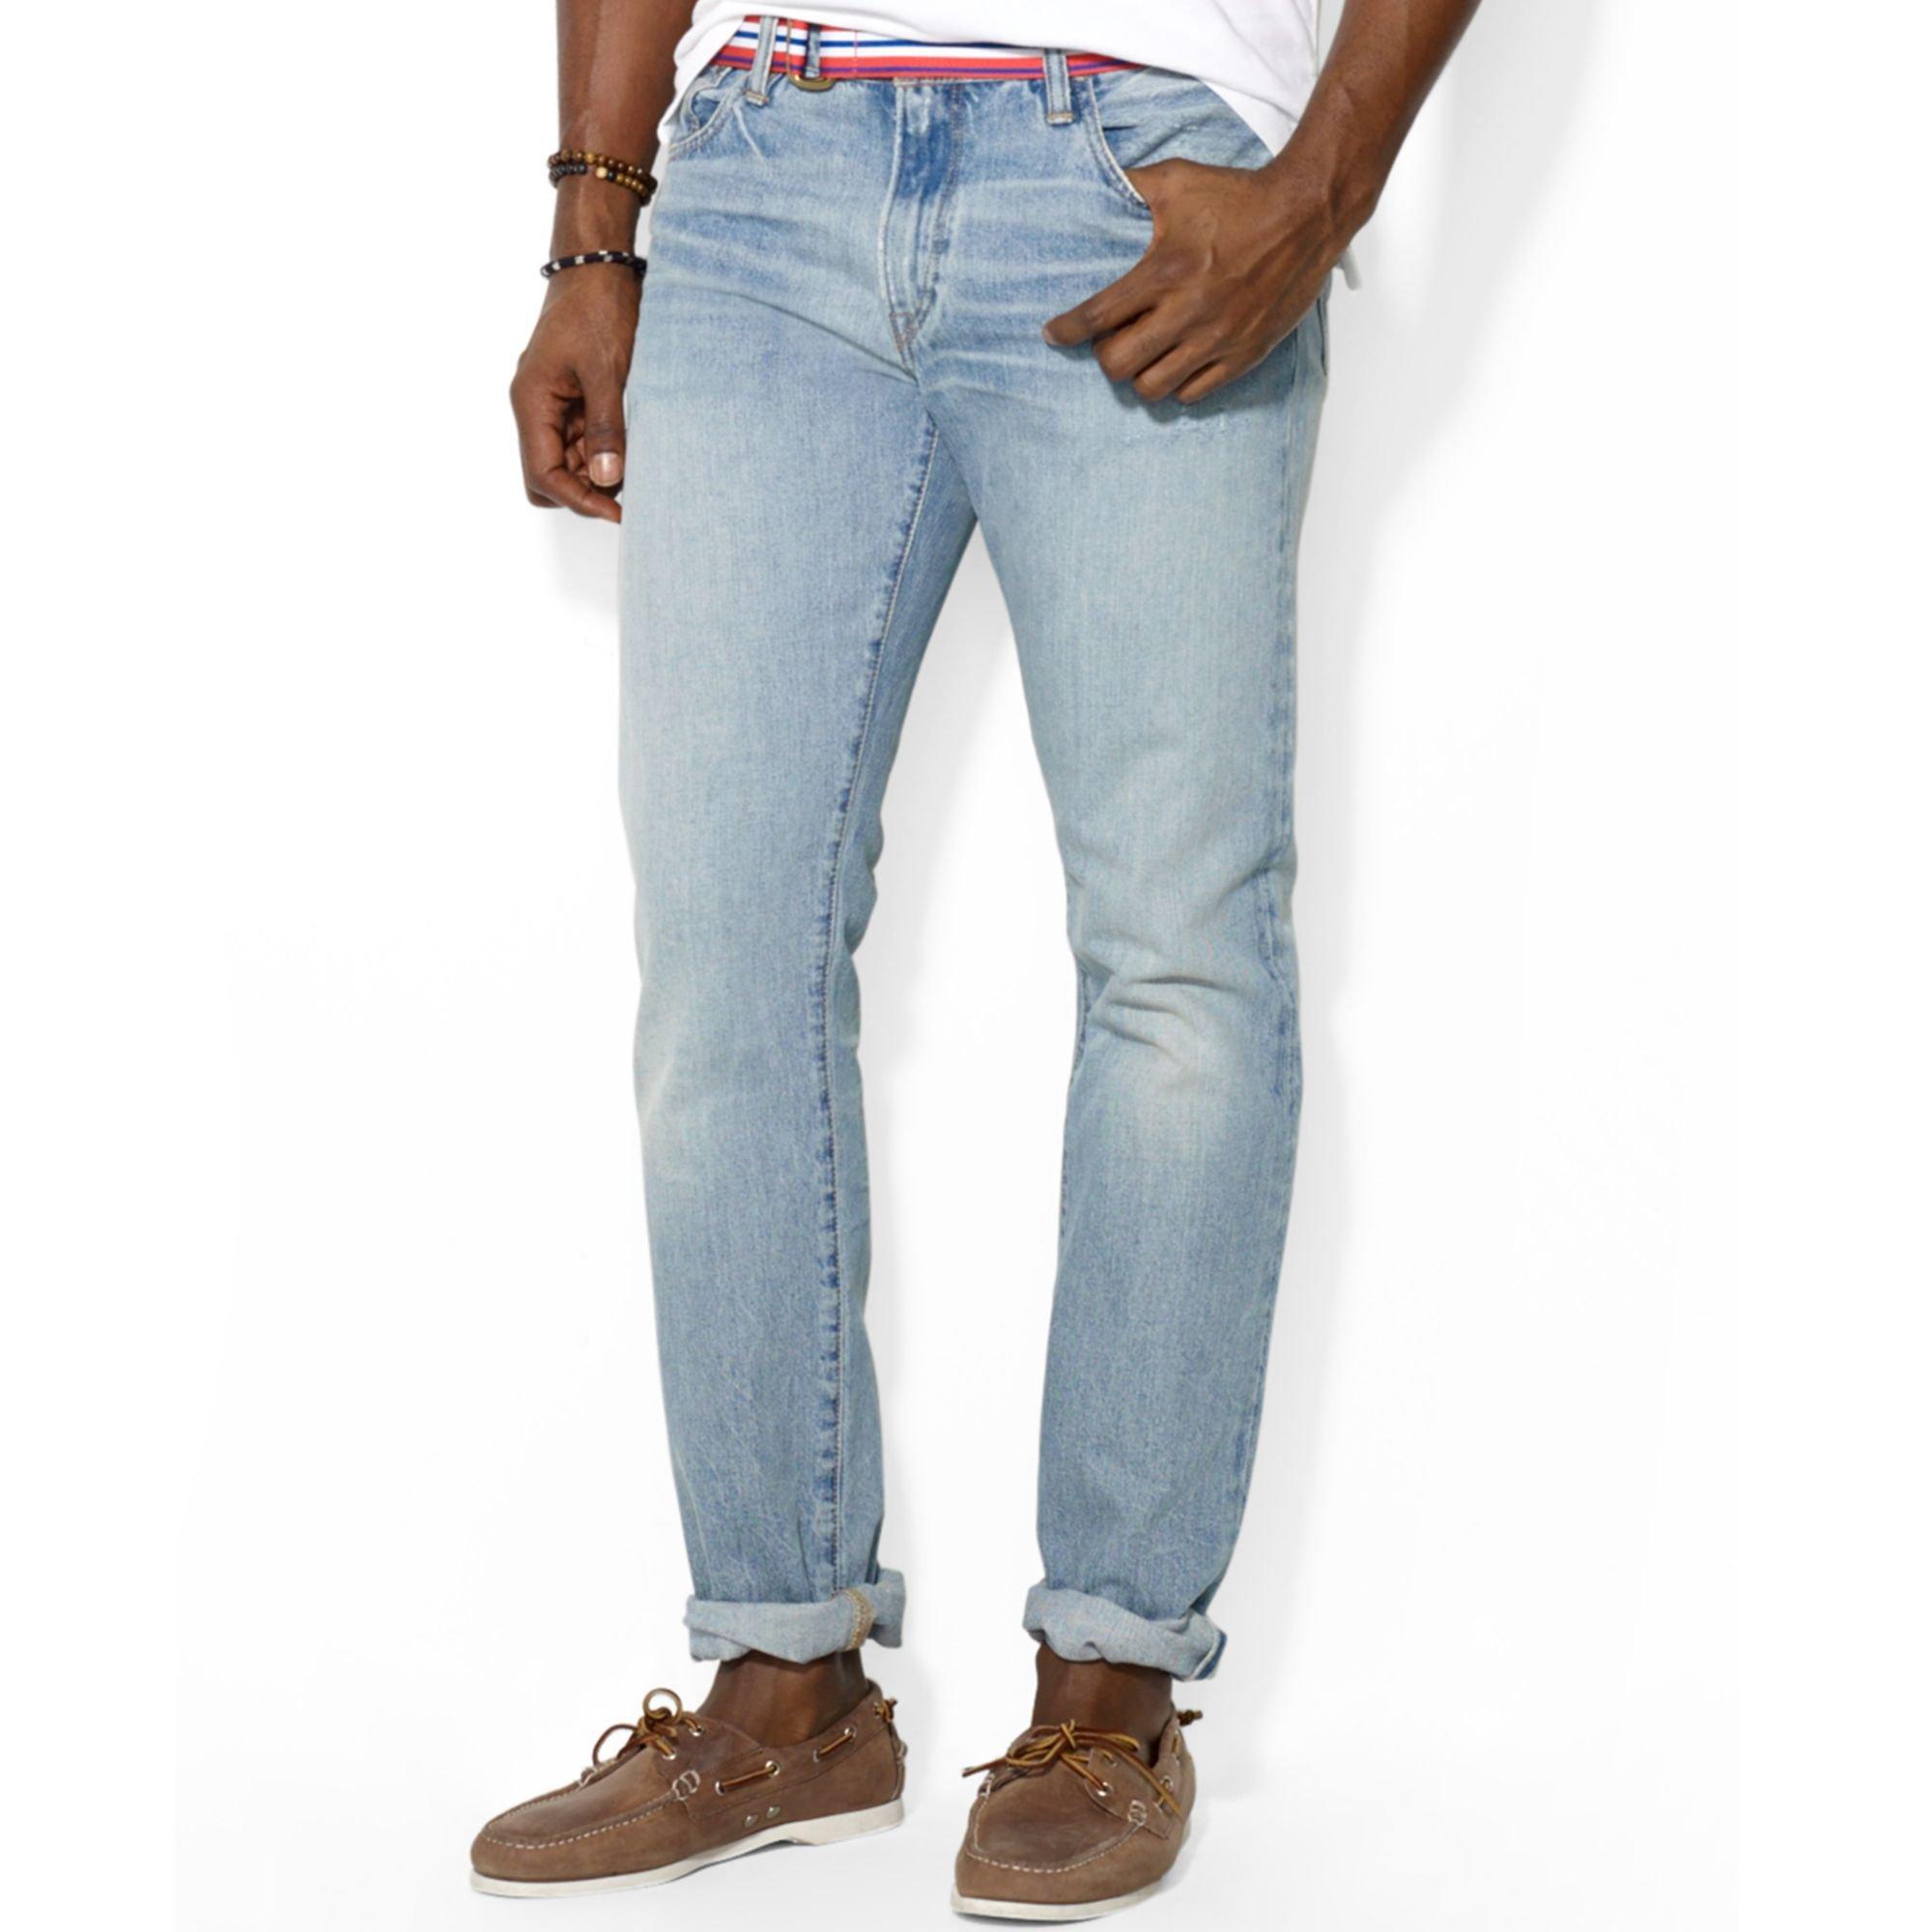 mens fleece jacket, wrangler jeans, tall t-shirt, denim shirt, womans denim shirt, sport tee shirt, mens sweat pants, big t-shirt,sweatshirt, hoodie, big and tall, 6xlt Rocky's Big And Tall Items: 0.